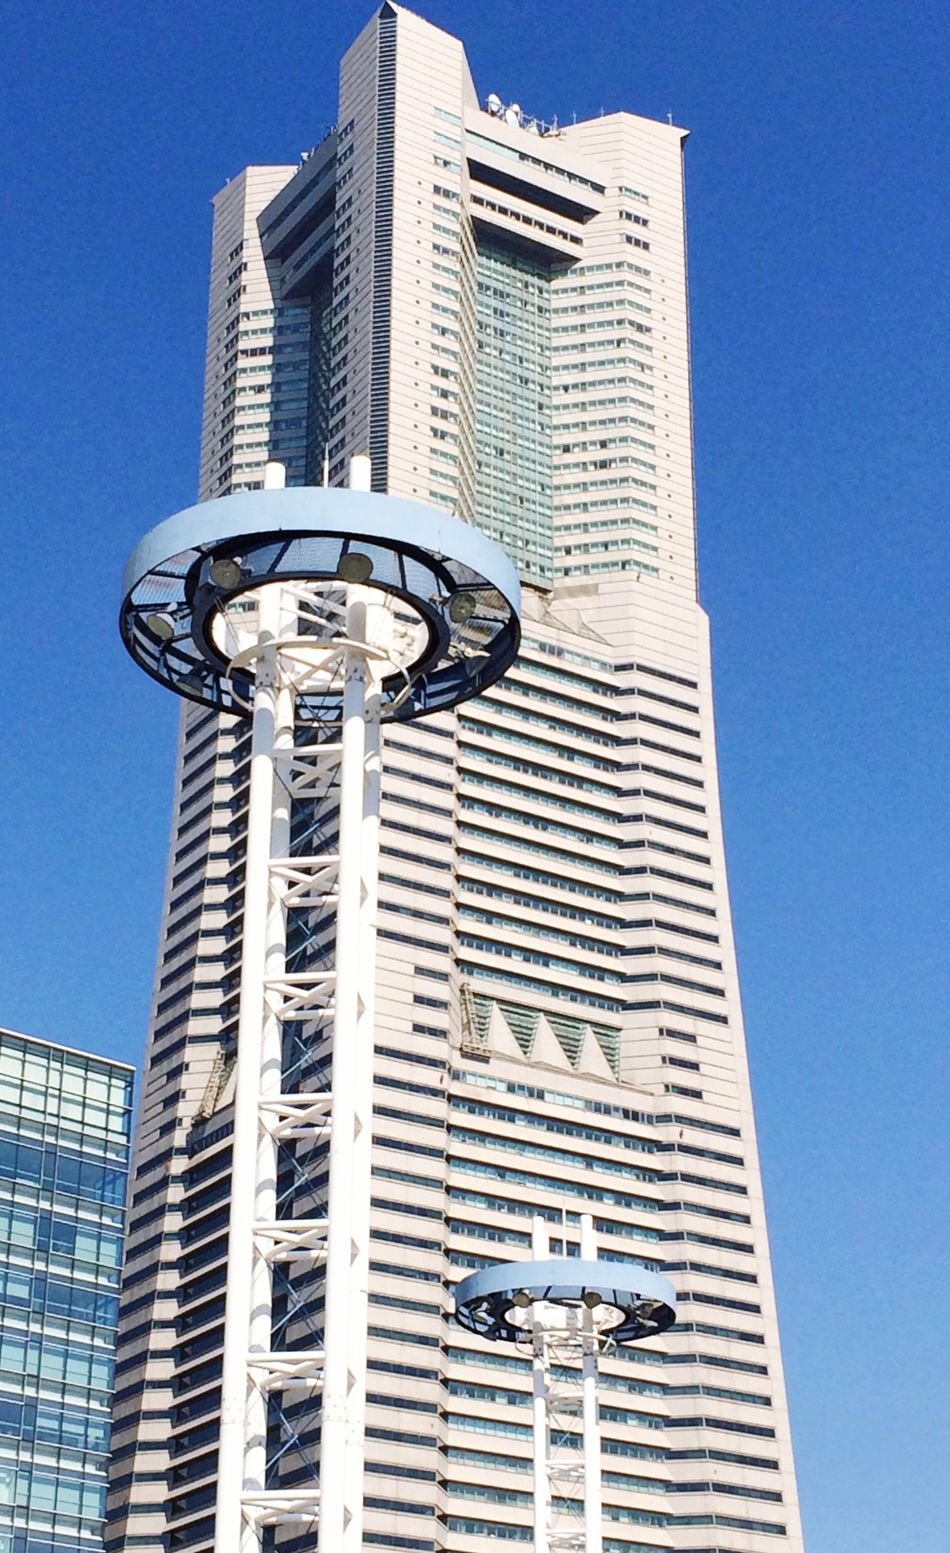 Aweekago I was in Sakuragicho Yokohama in front of Landmarktower 桜木町 横浜 横浜ランドマークタワー Underthebluesky